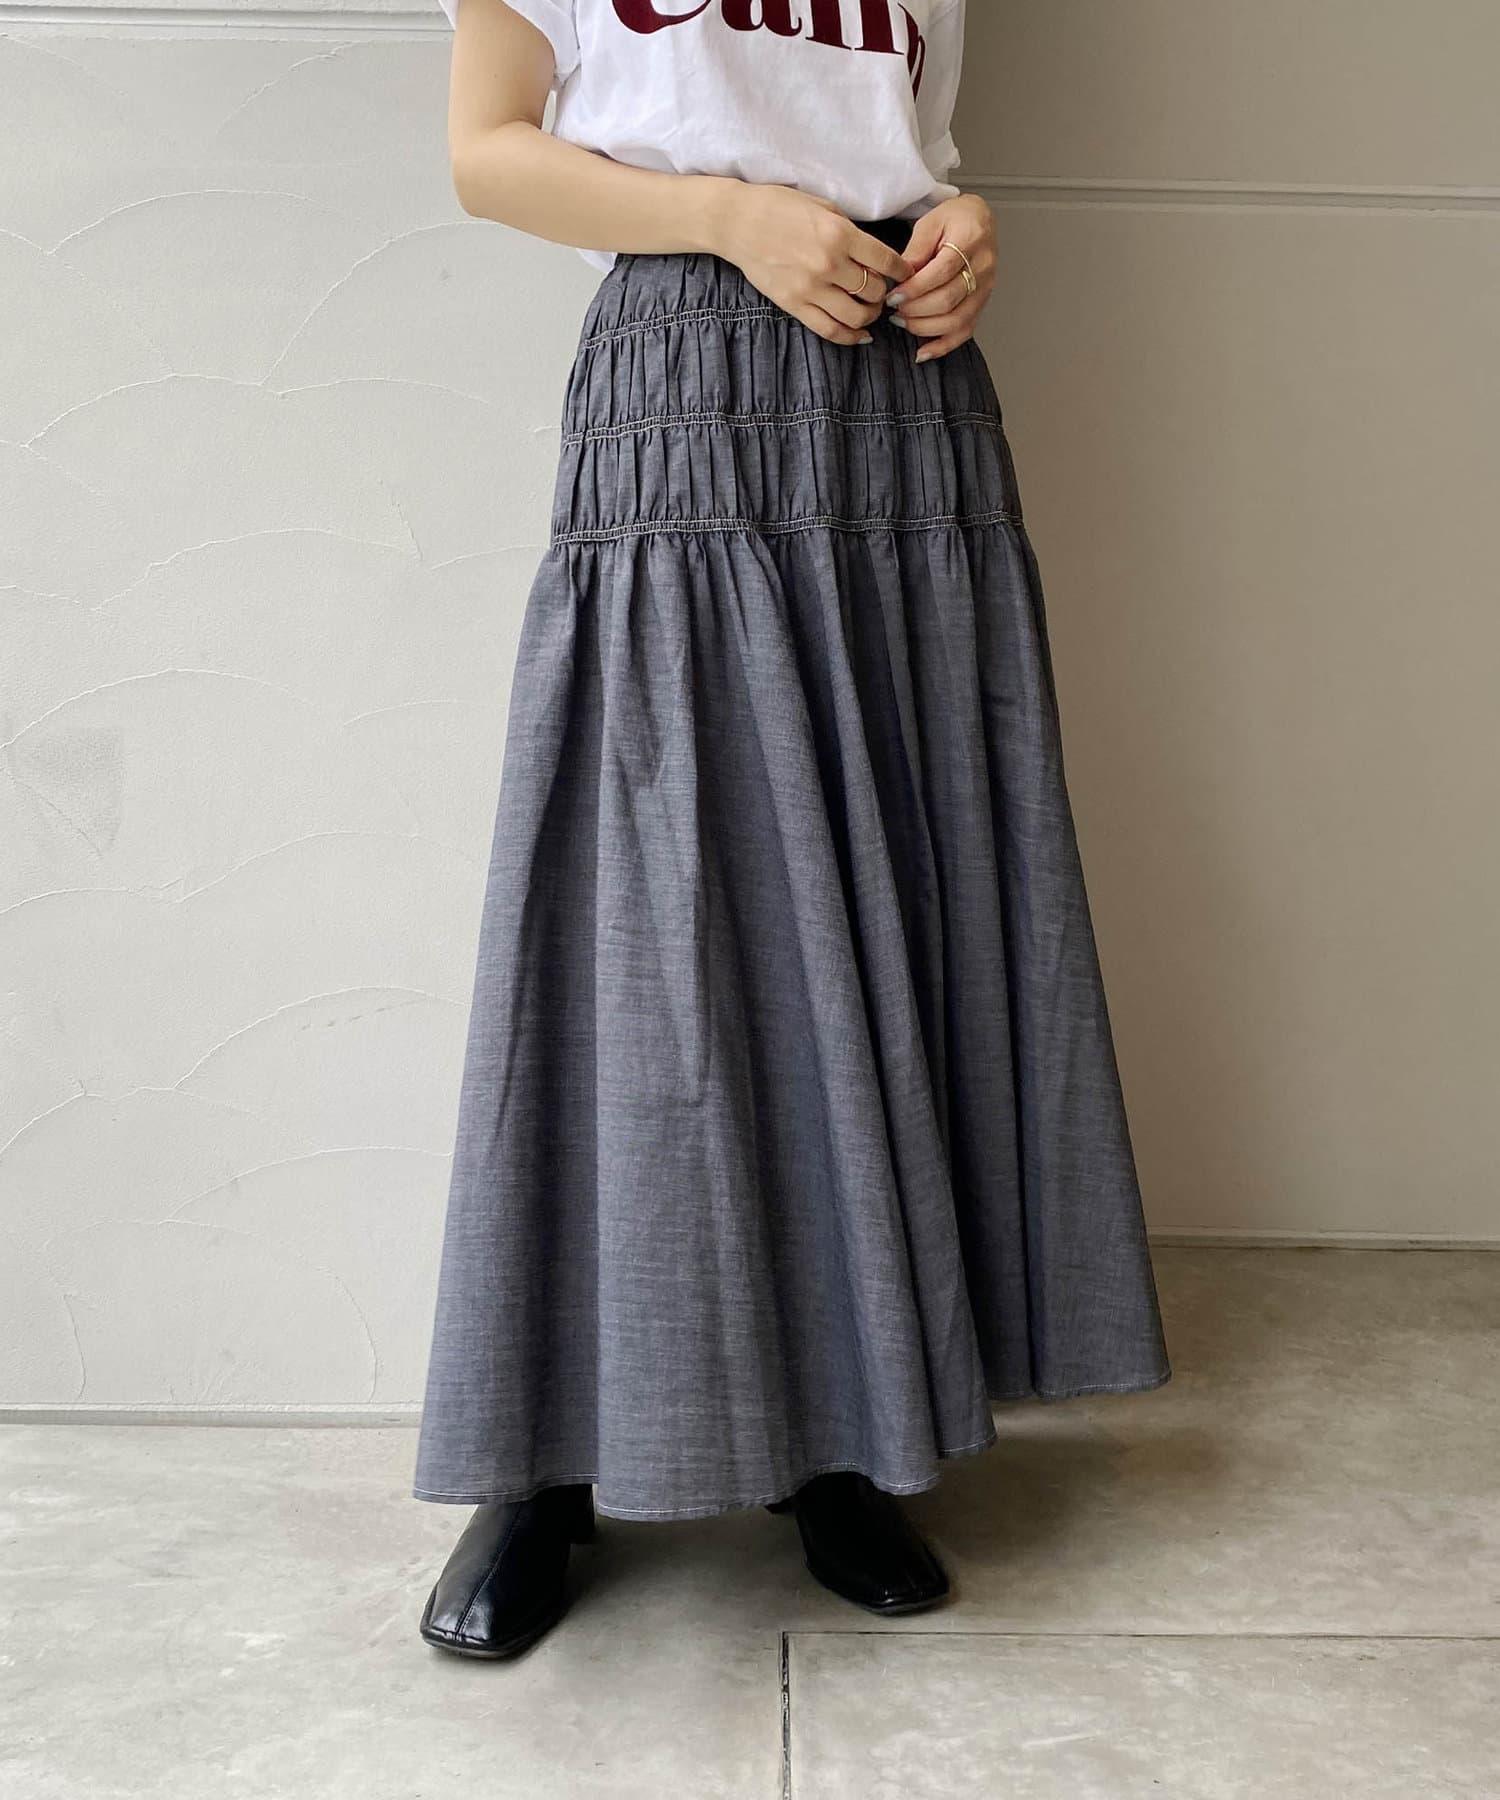 CAPRICIEUX LE'MAGE(カプリシュレマージュ) シャーリングロングスカート